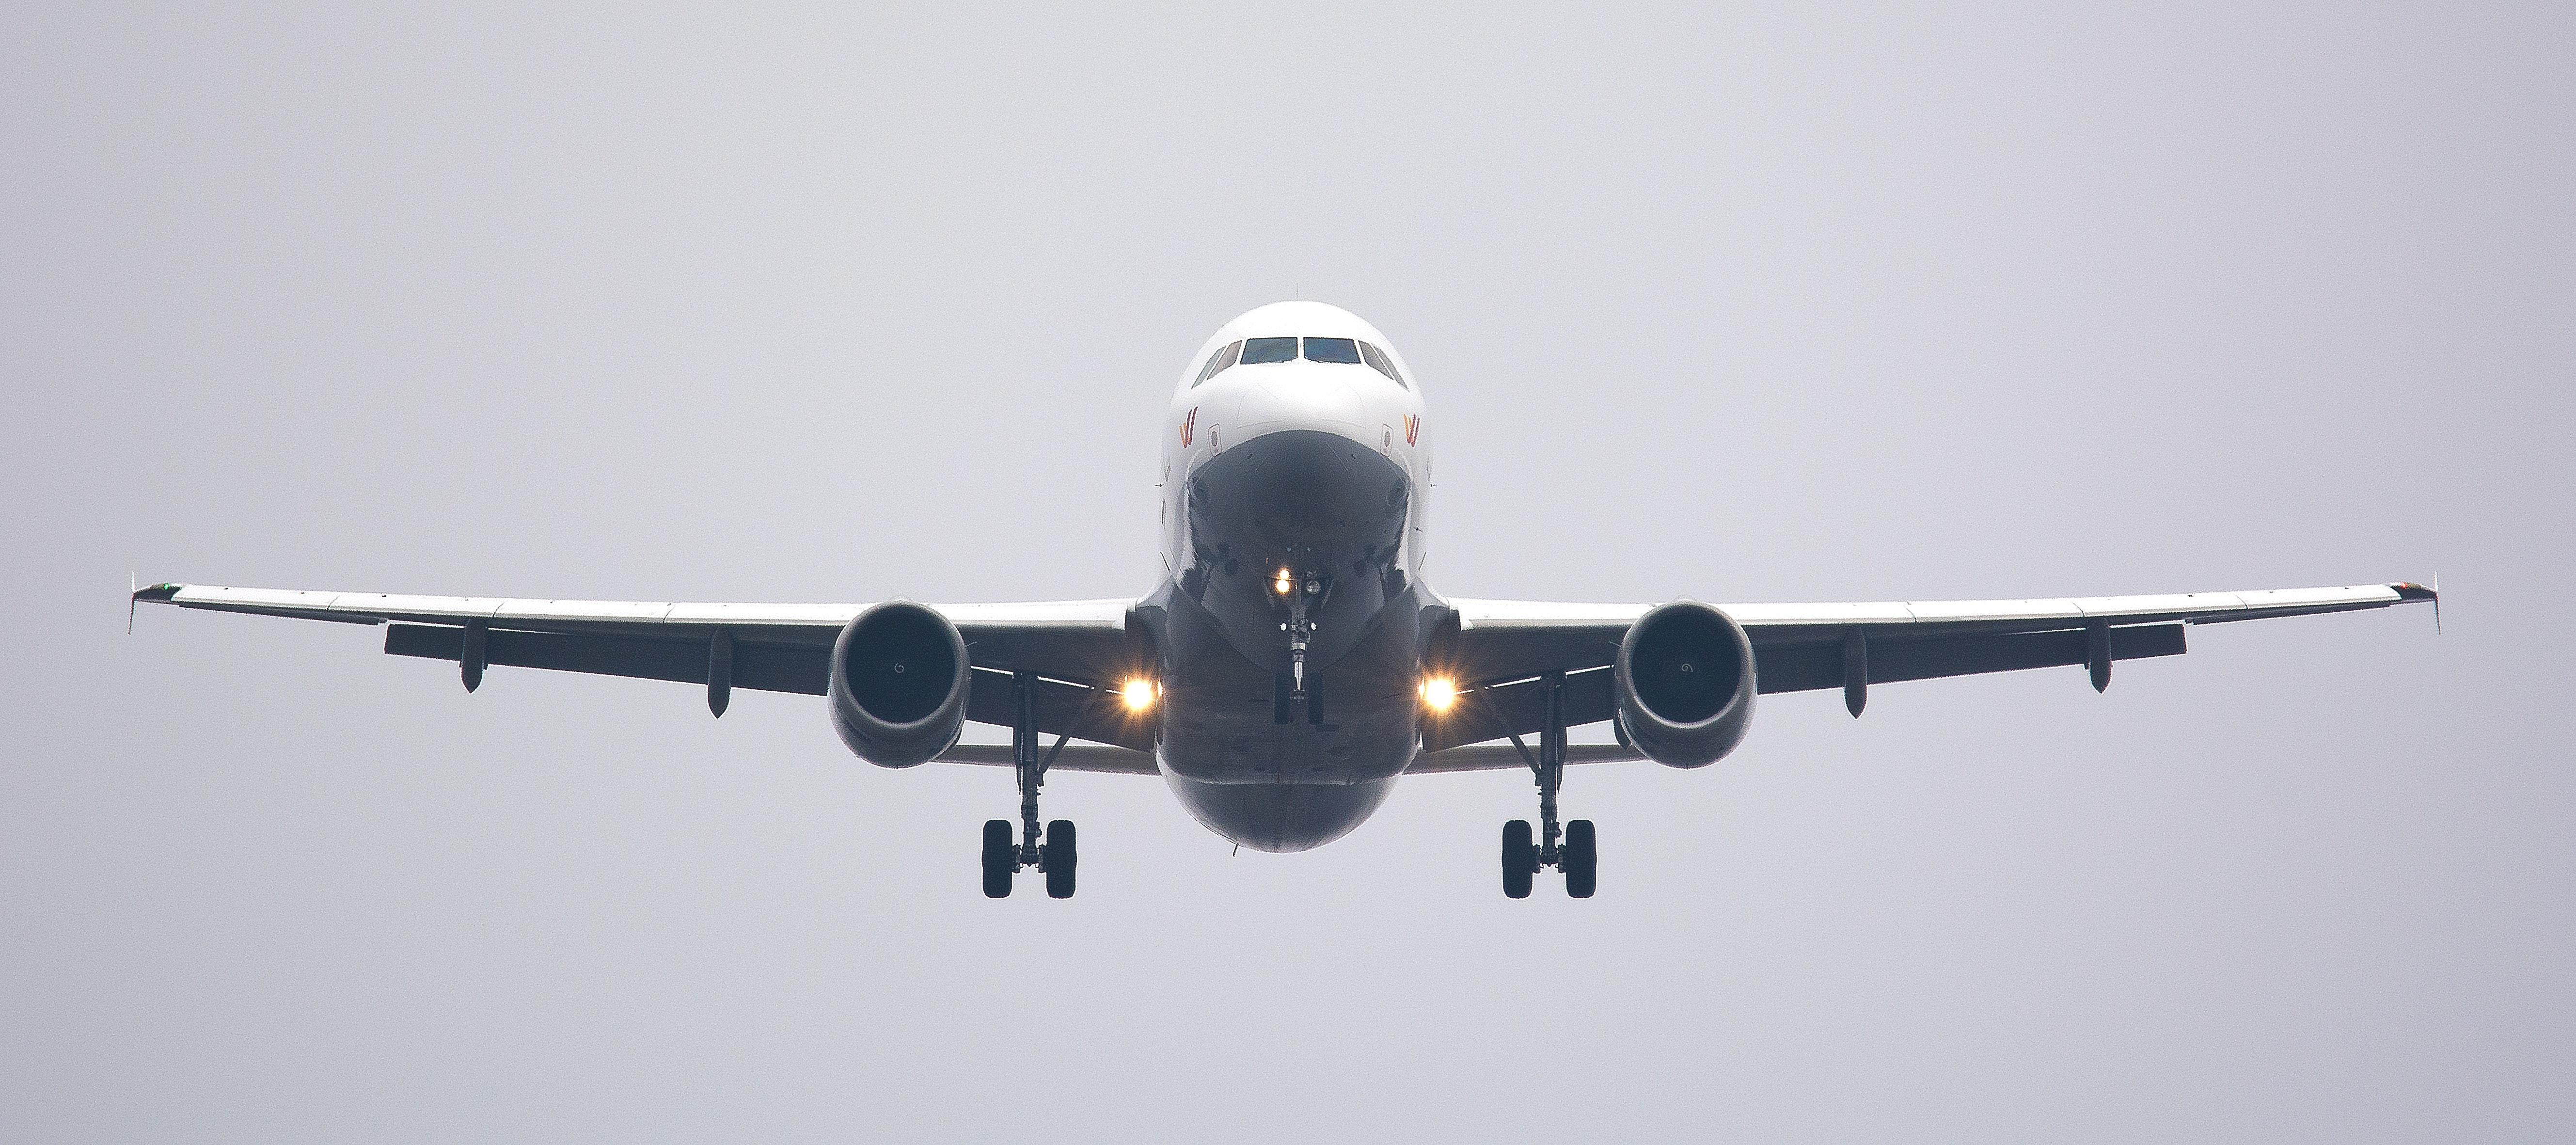 No-Deal Brexit Could Affect Most UK-Spain Flights